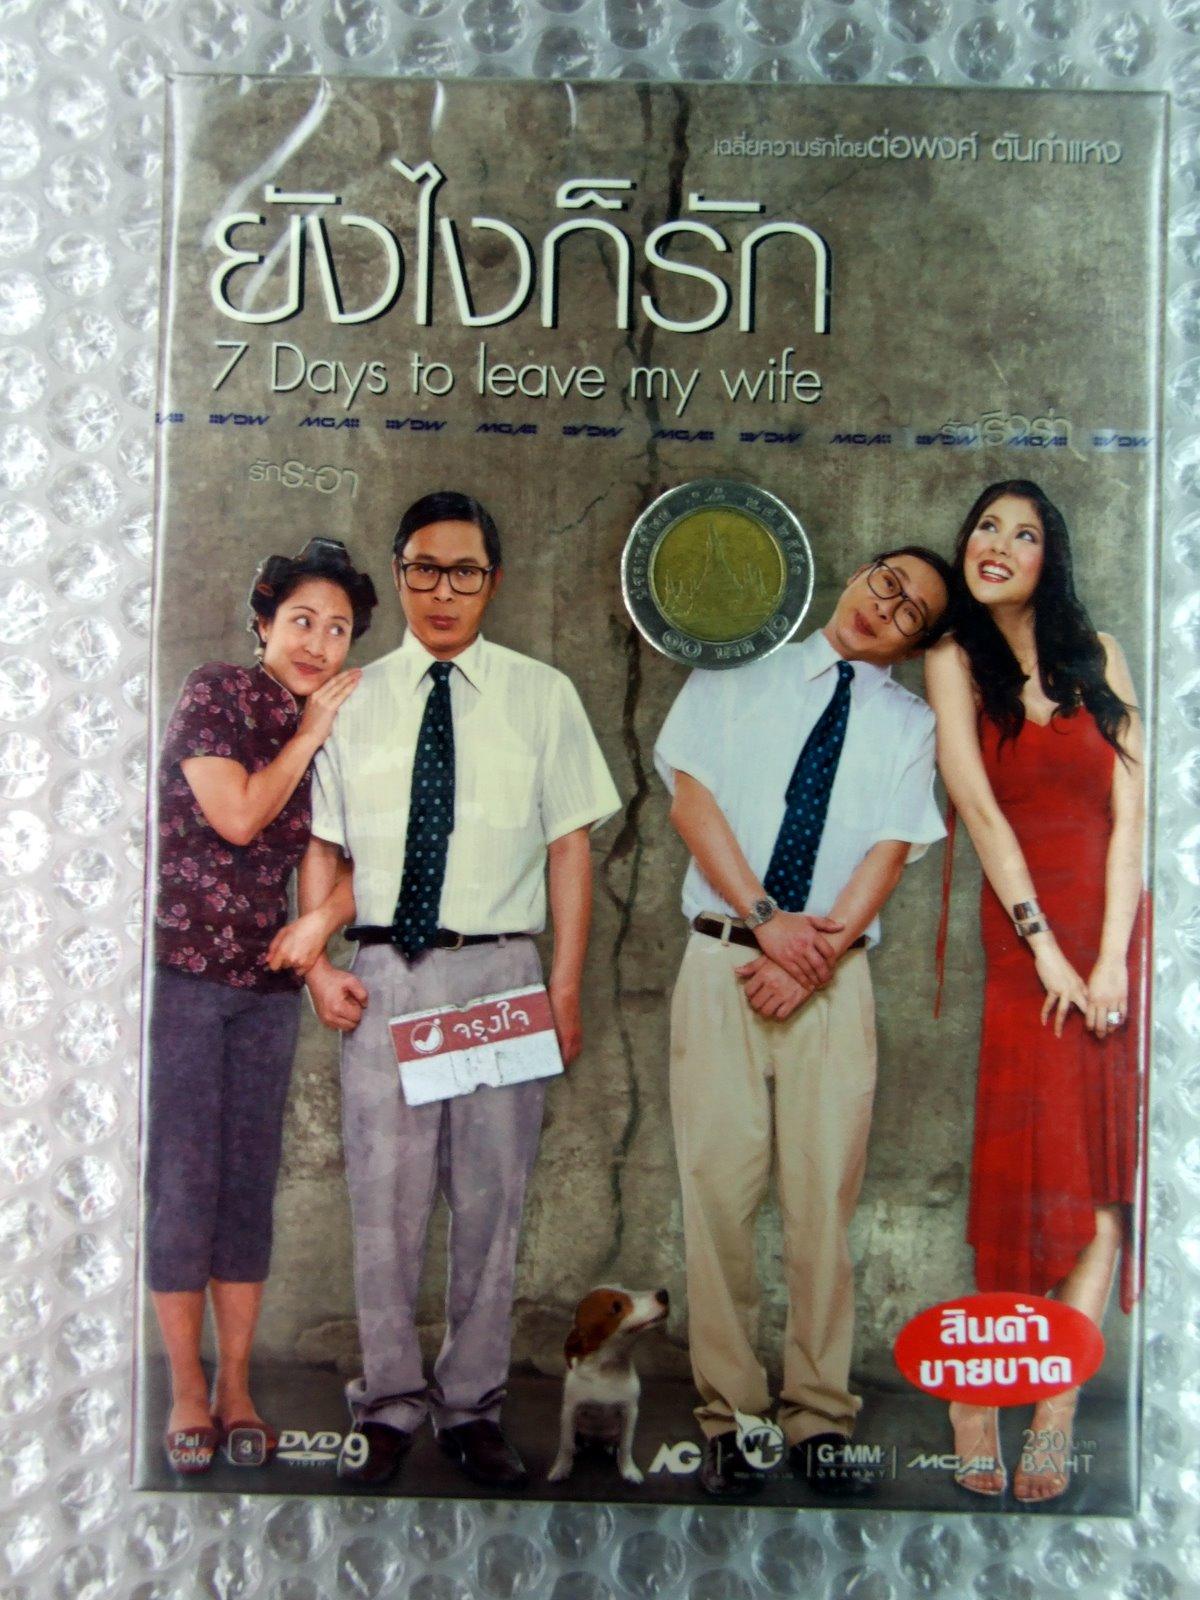 ������������� ��������������� dvd ����������������� ������������ ���������������